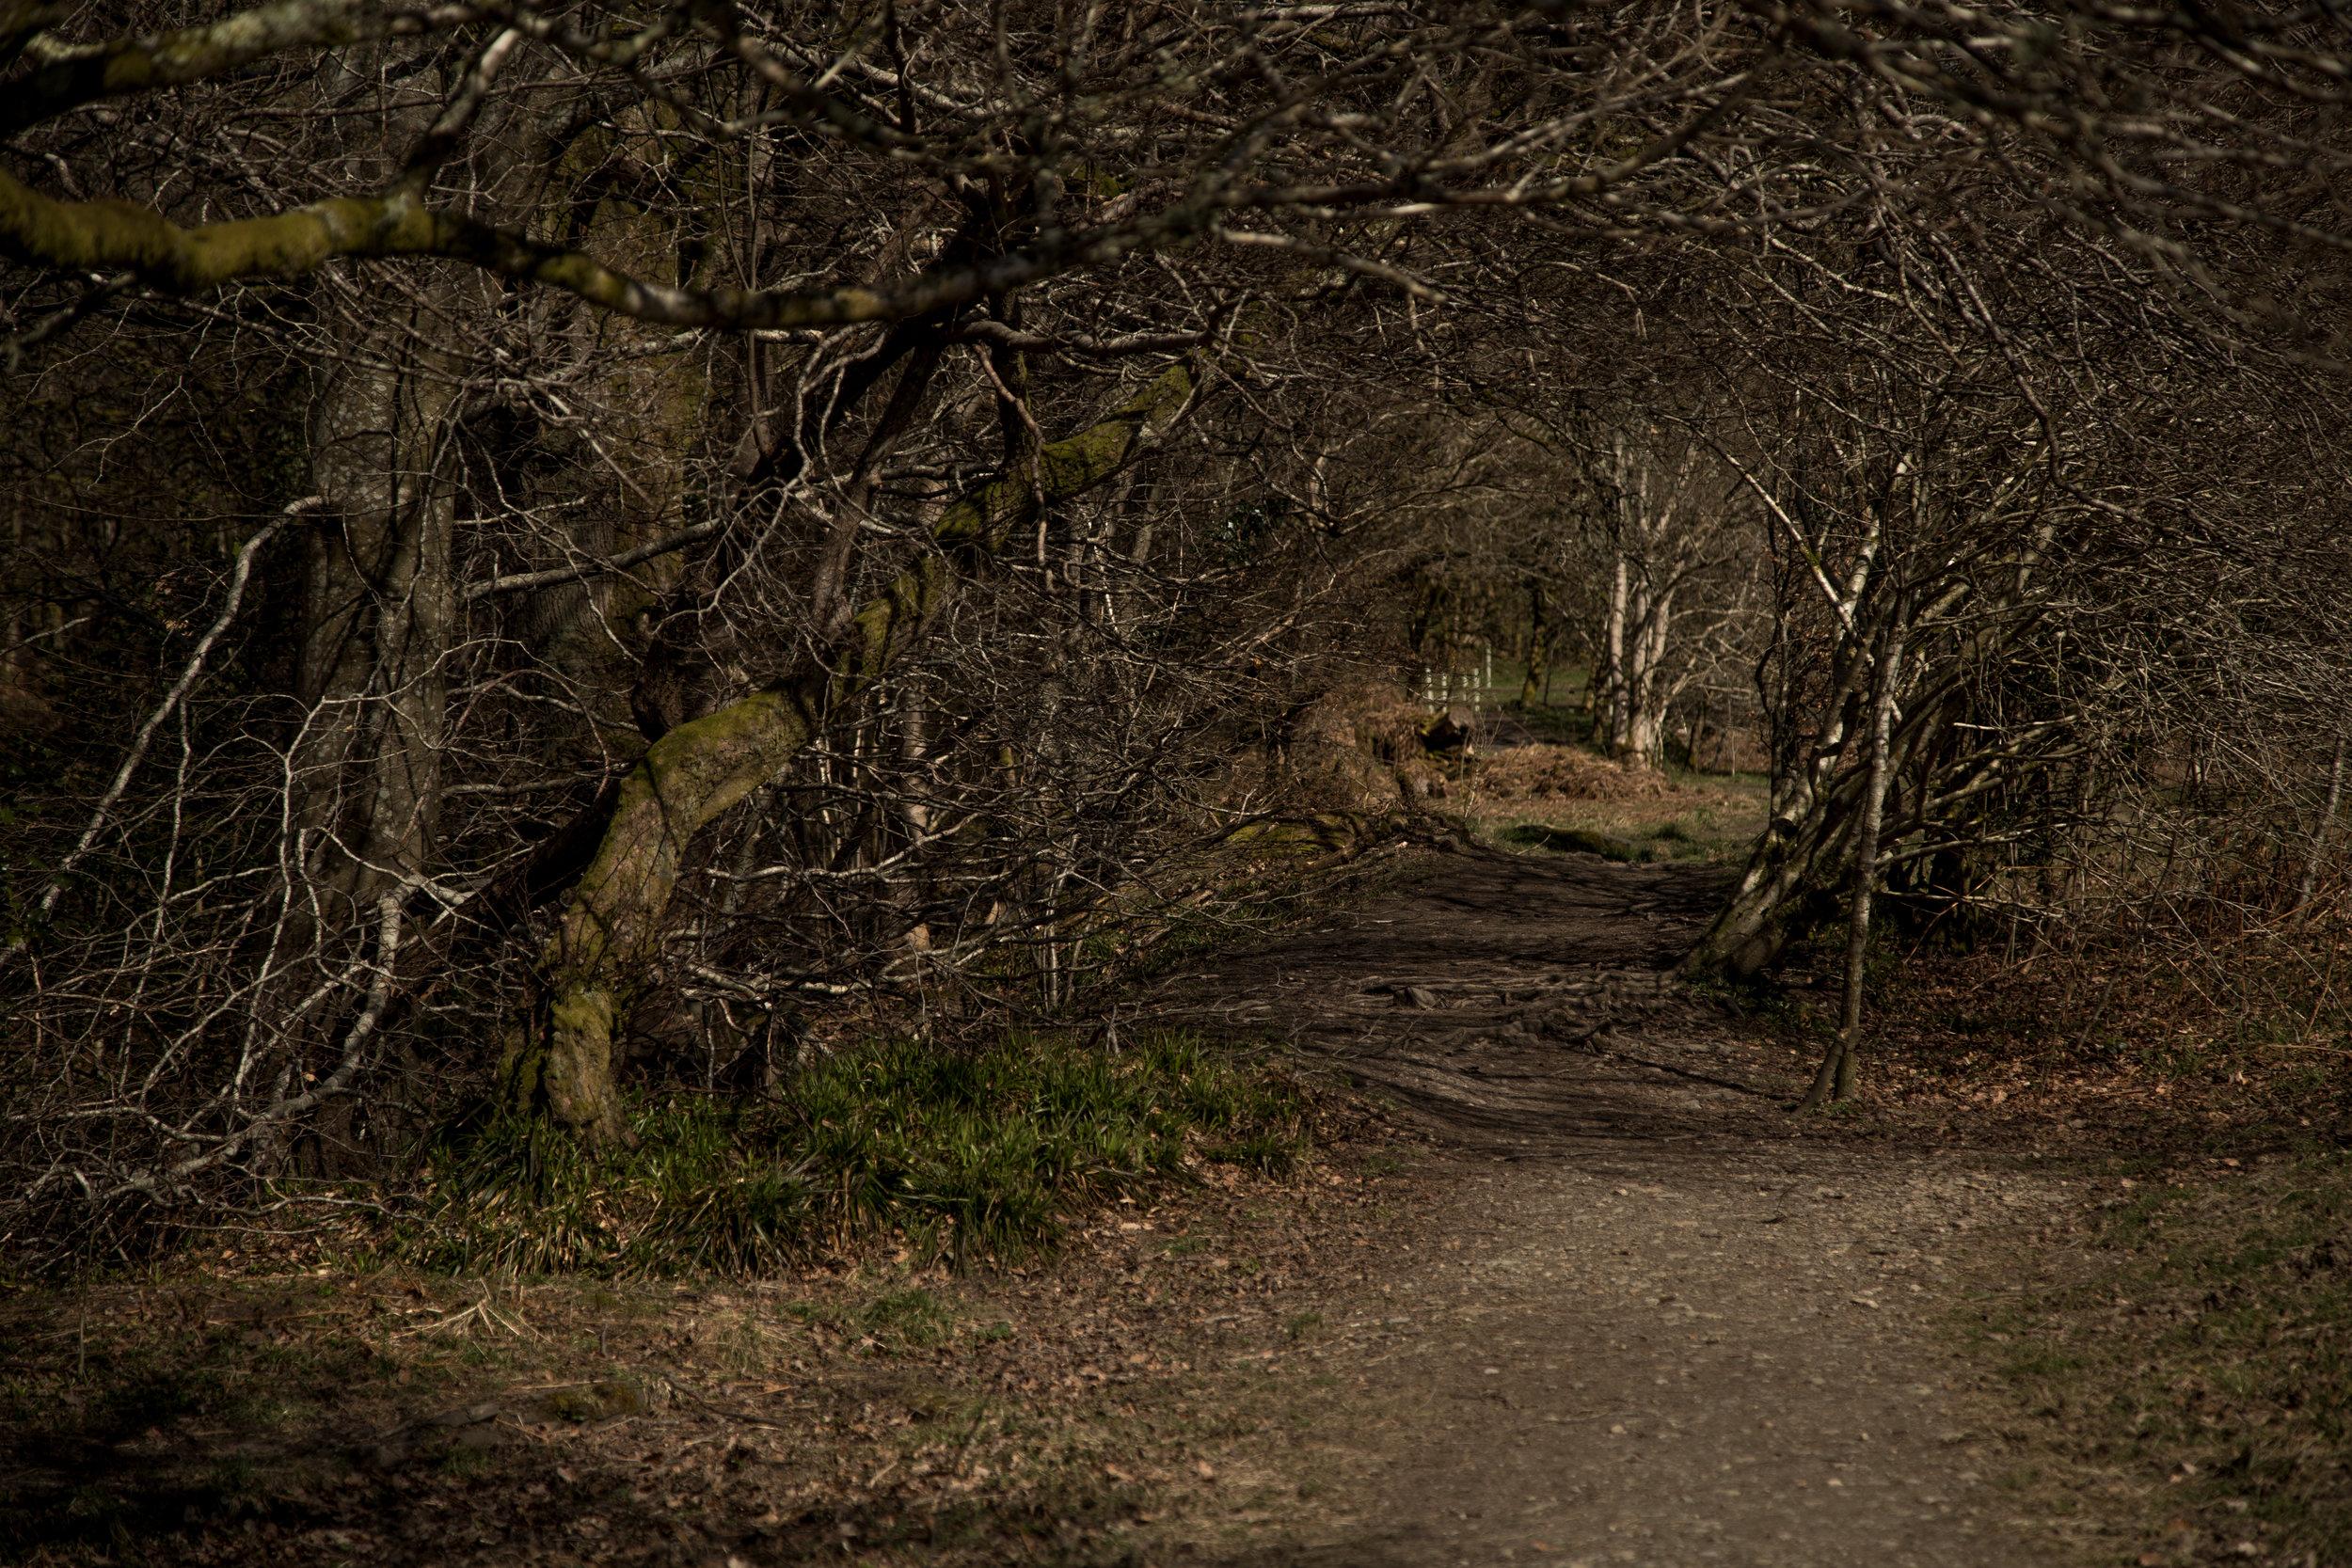 180401-Helensburgh-028.jpg